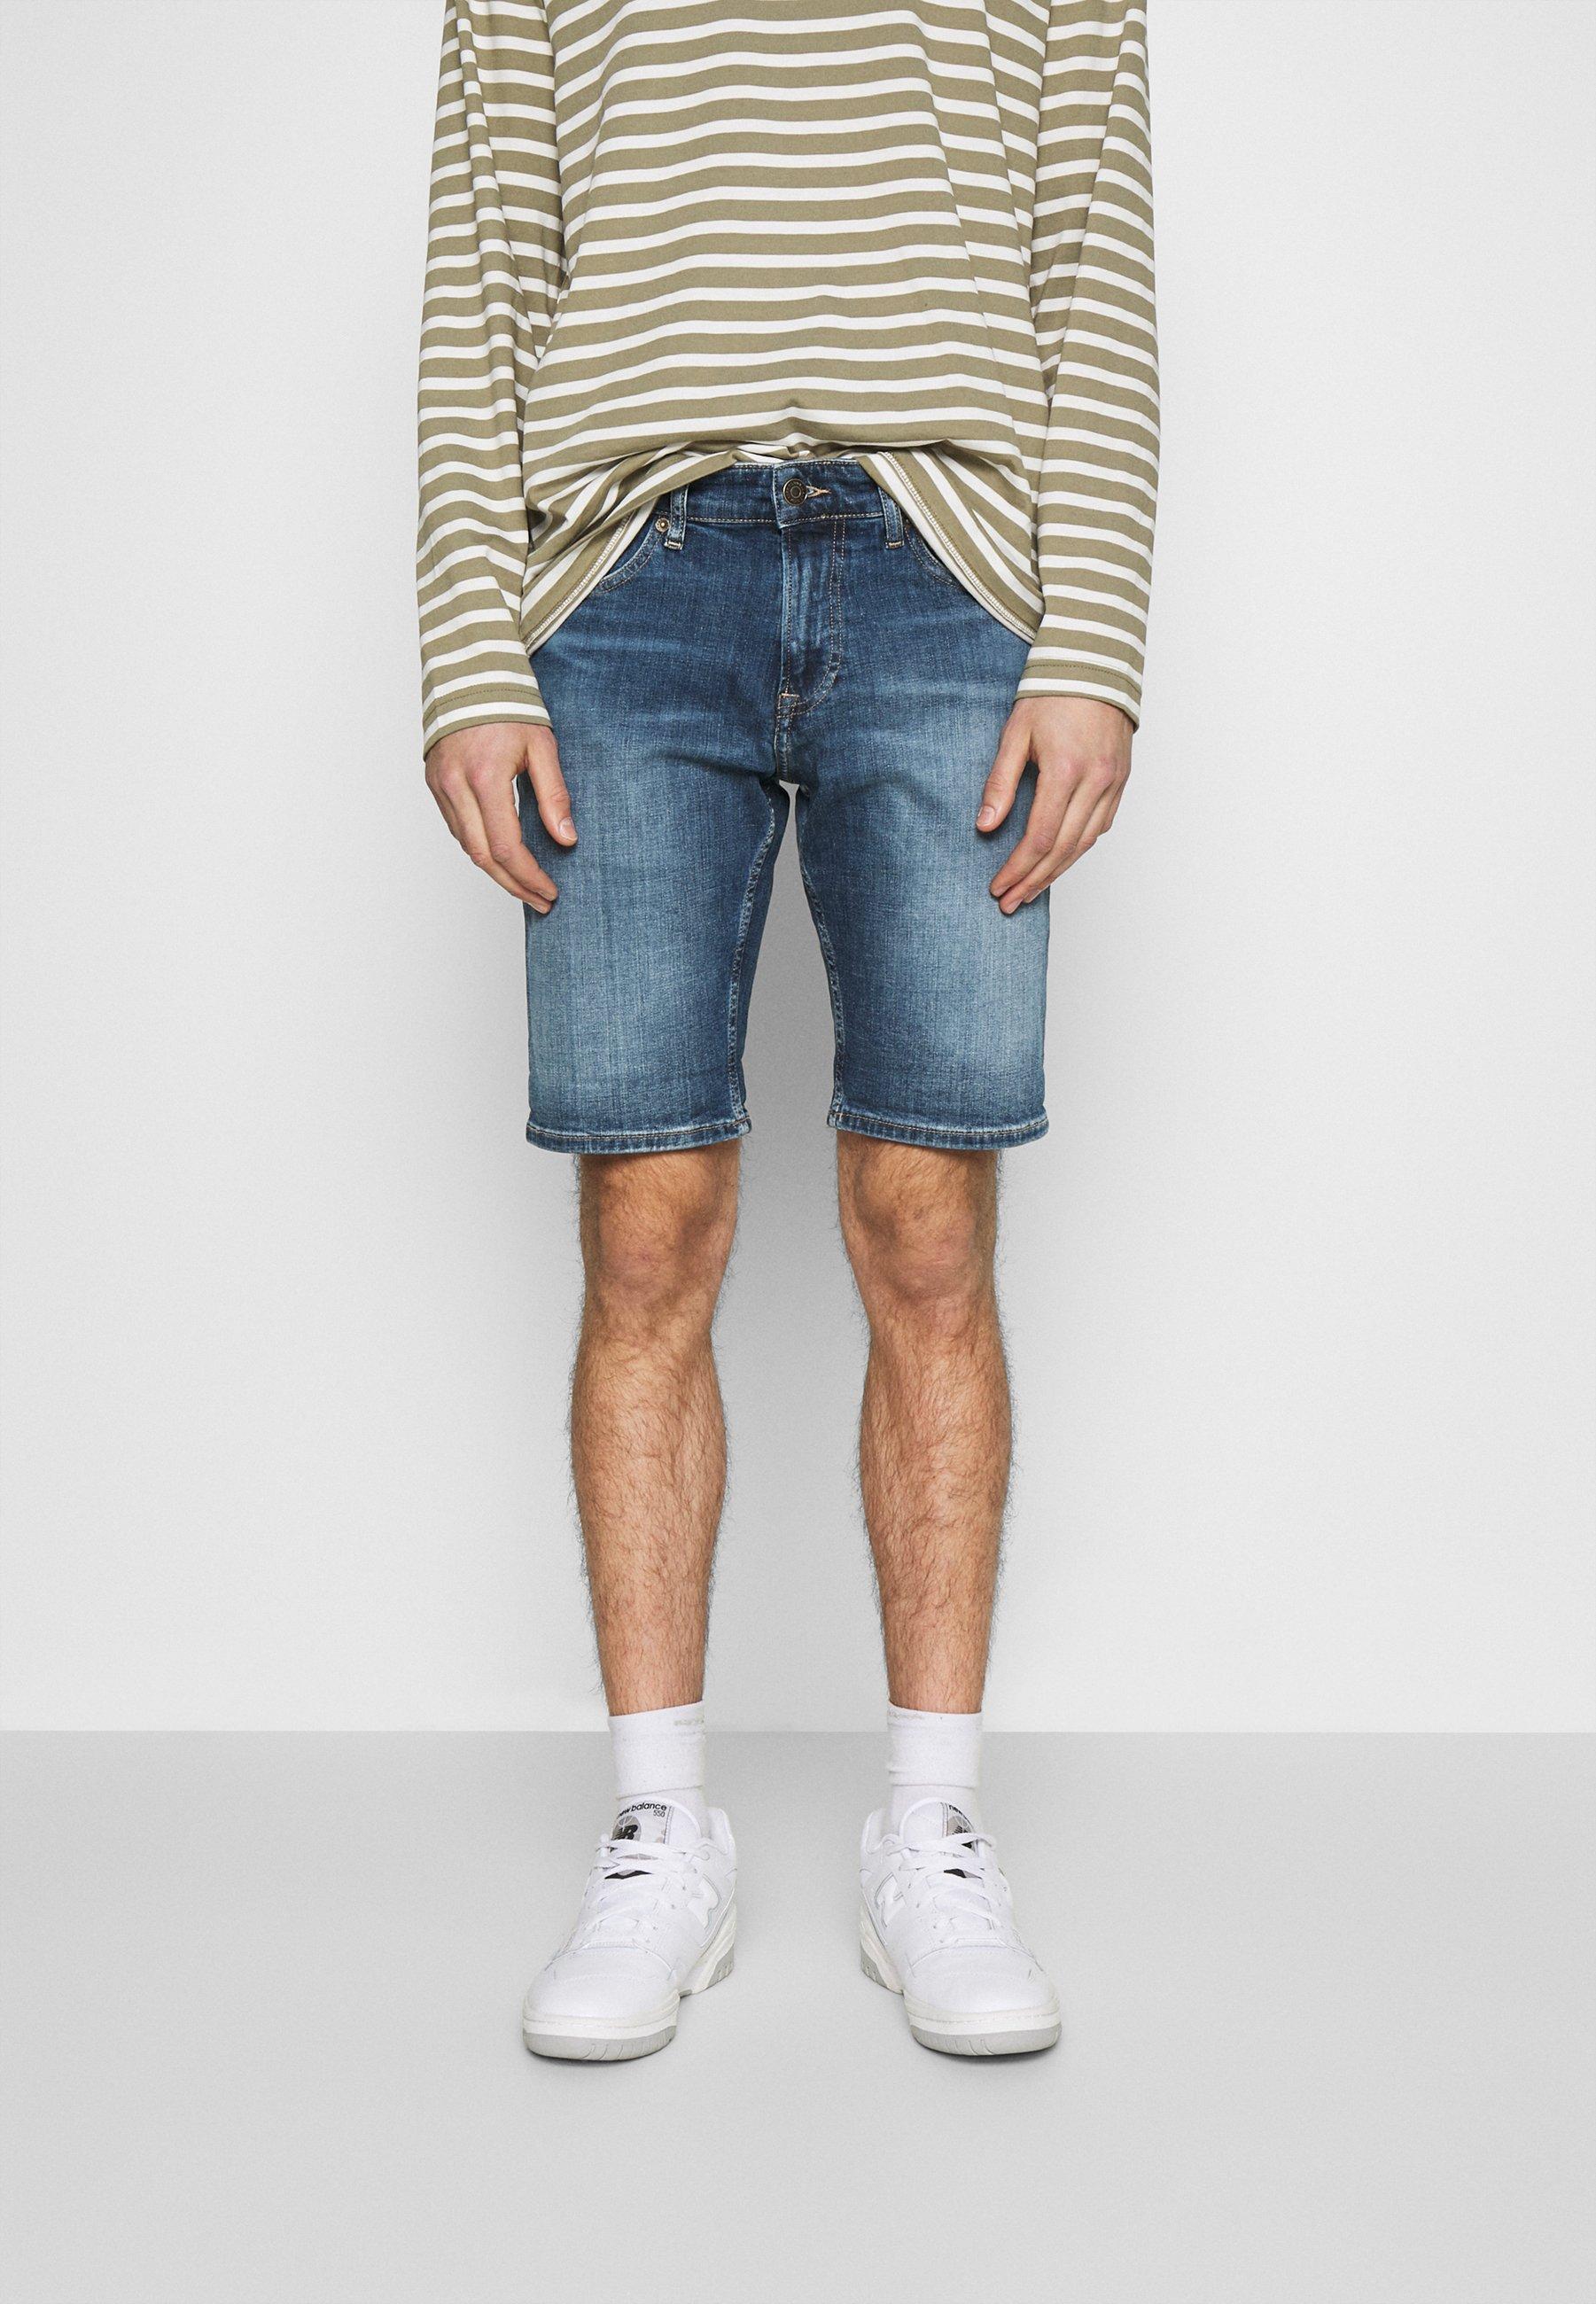 Homme SCANTON SLIM DENIM  - Short en jean - hampton